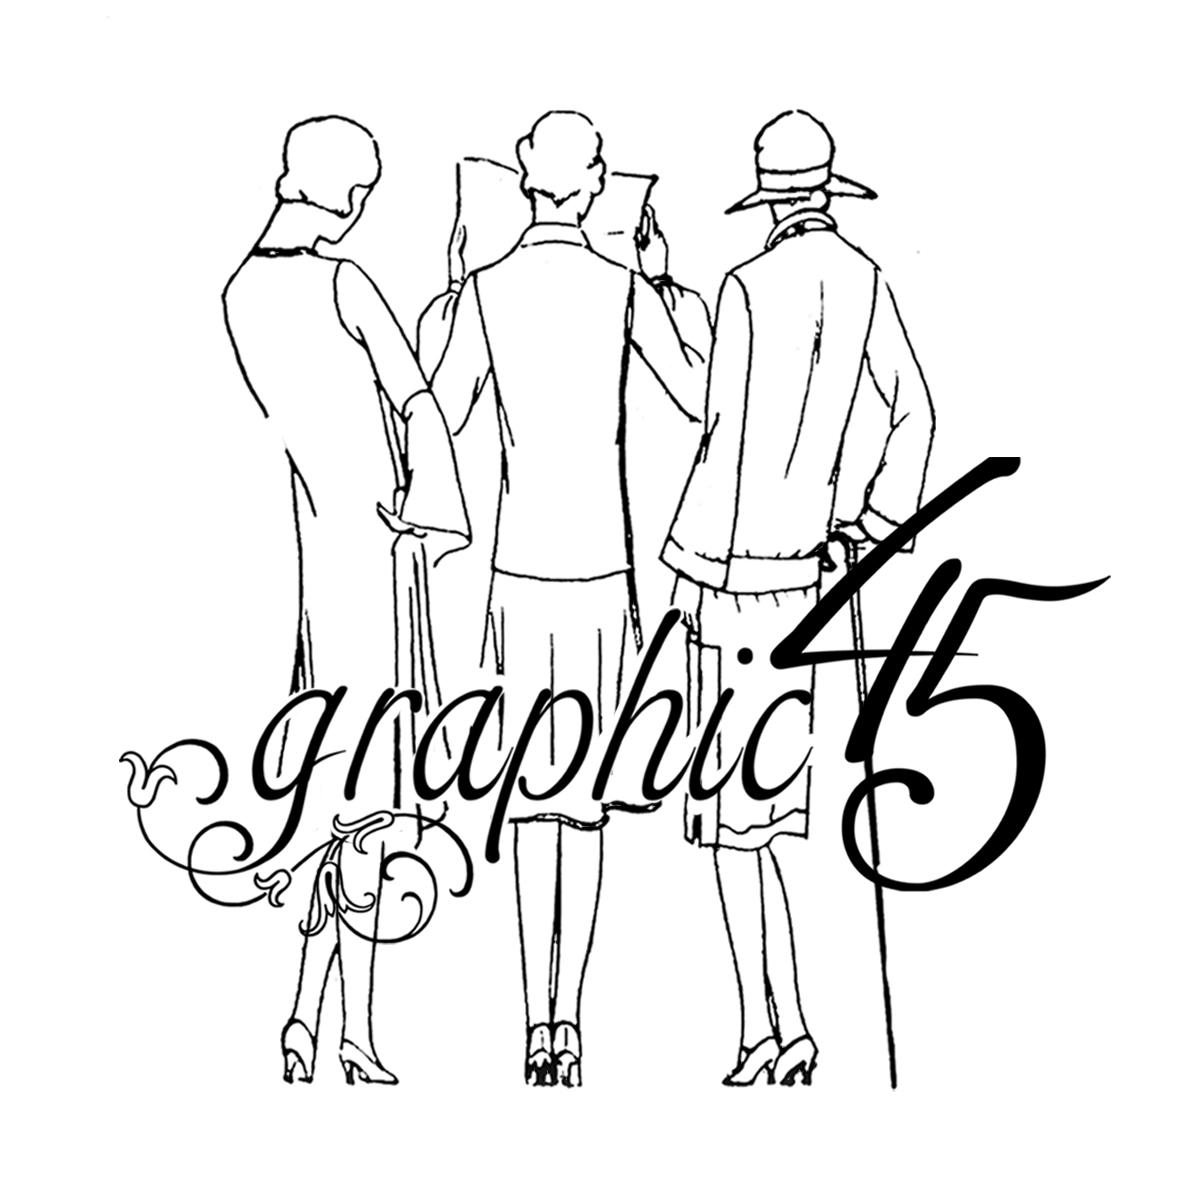 Graphic 45